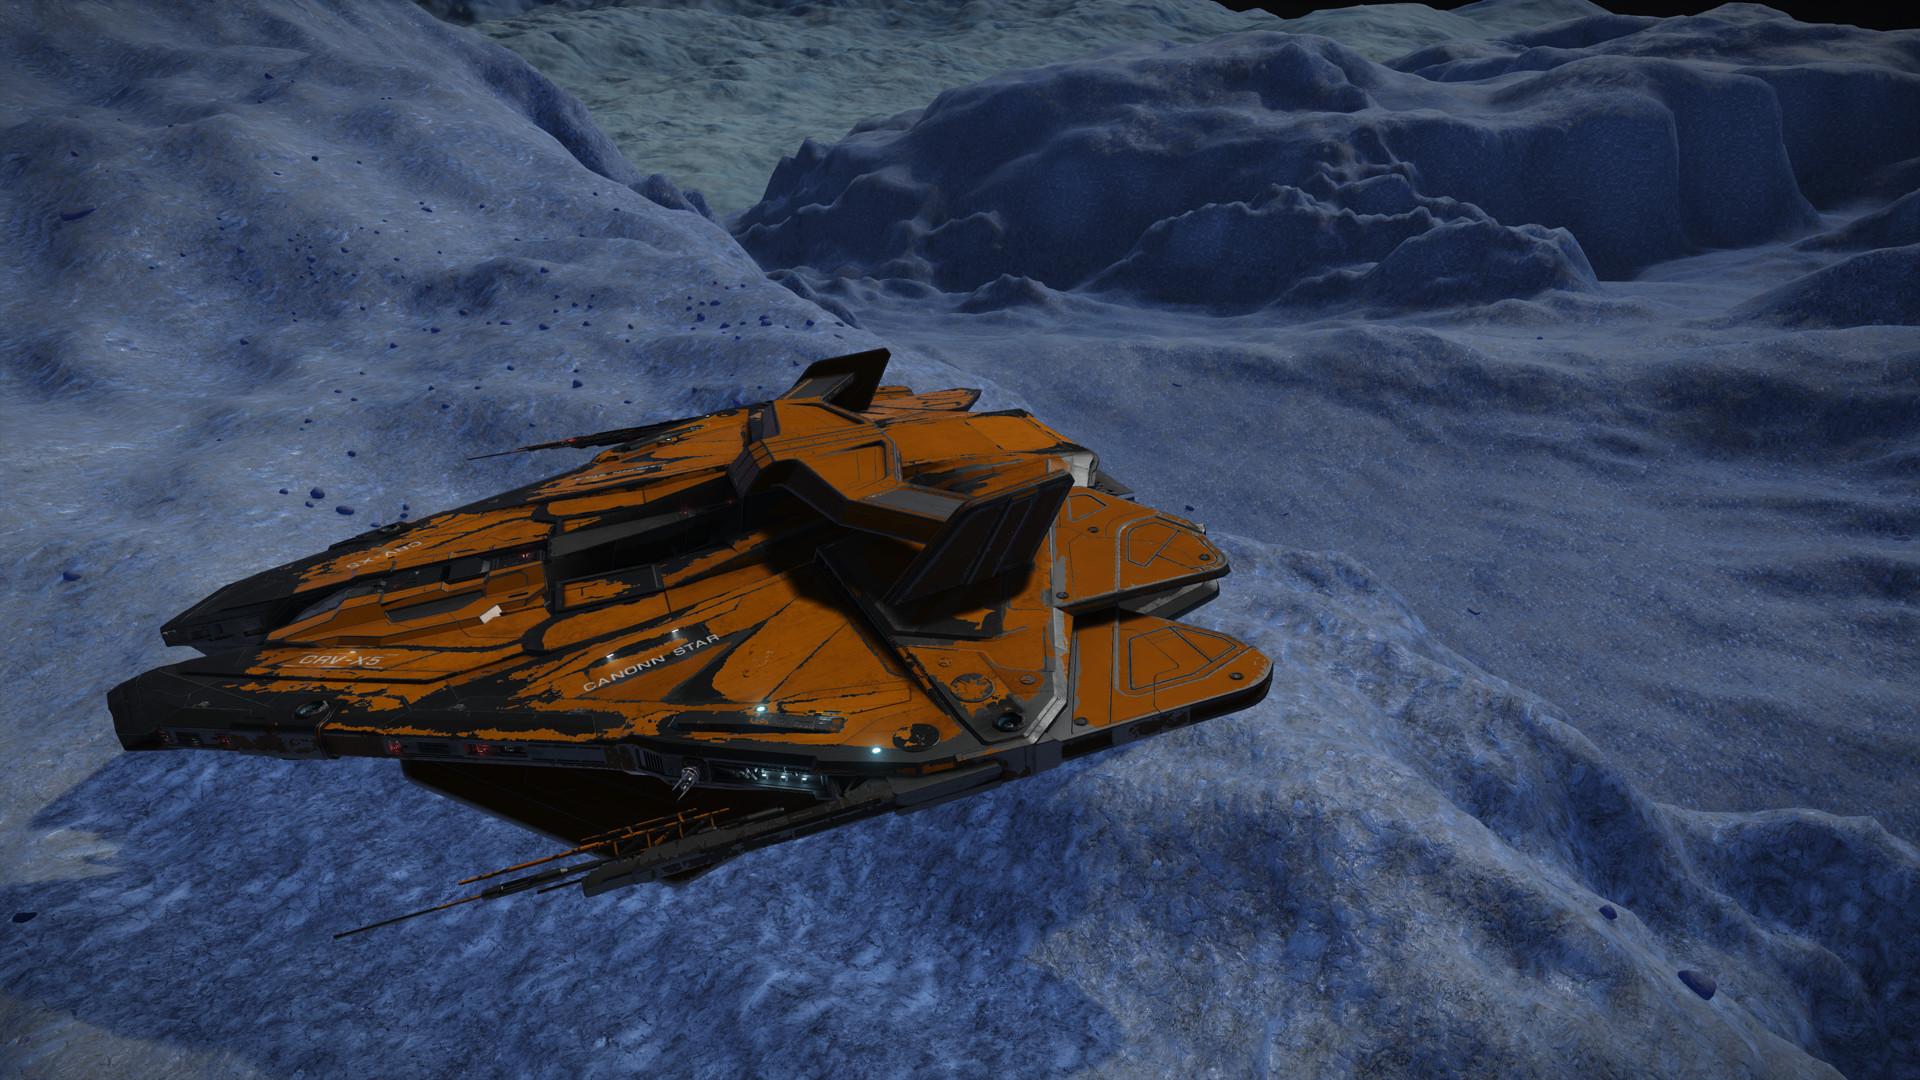 INARA - Elite:Dangerous companion